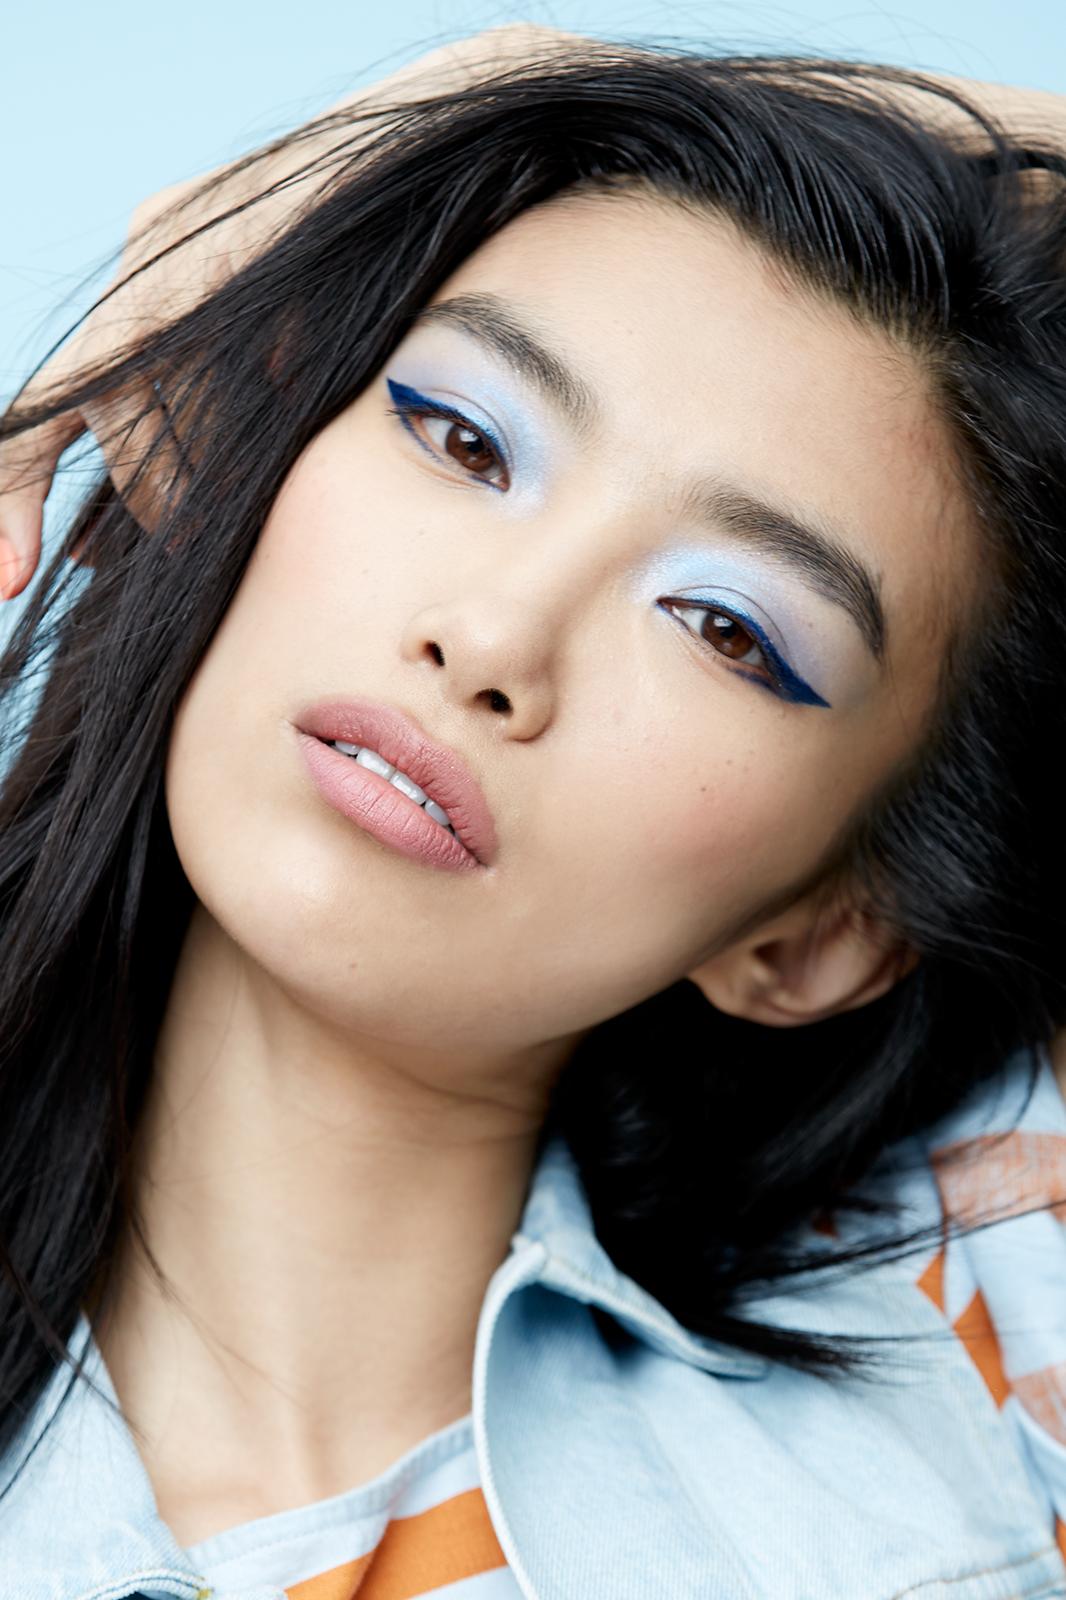 detail160225_R29_Beauty_BlueEye_Makeup_04_1423 copy.jpg